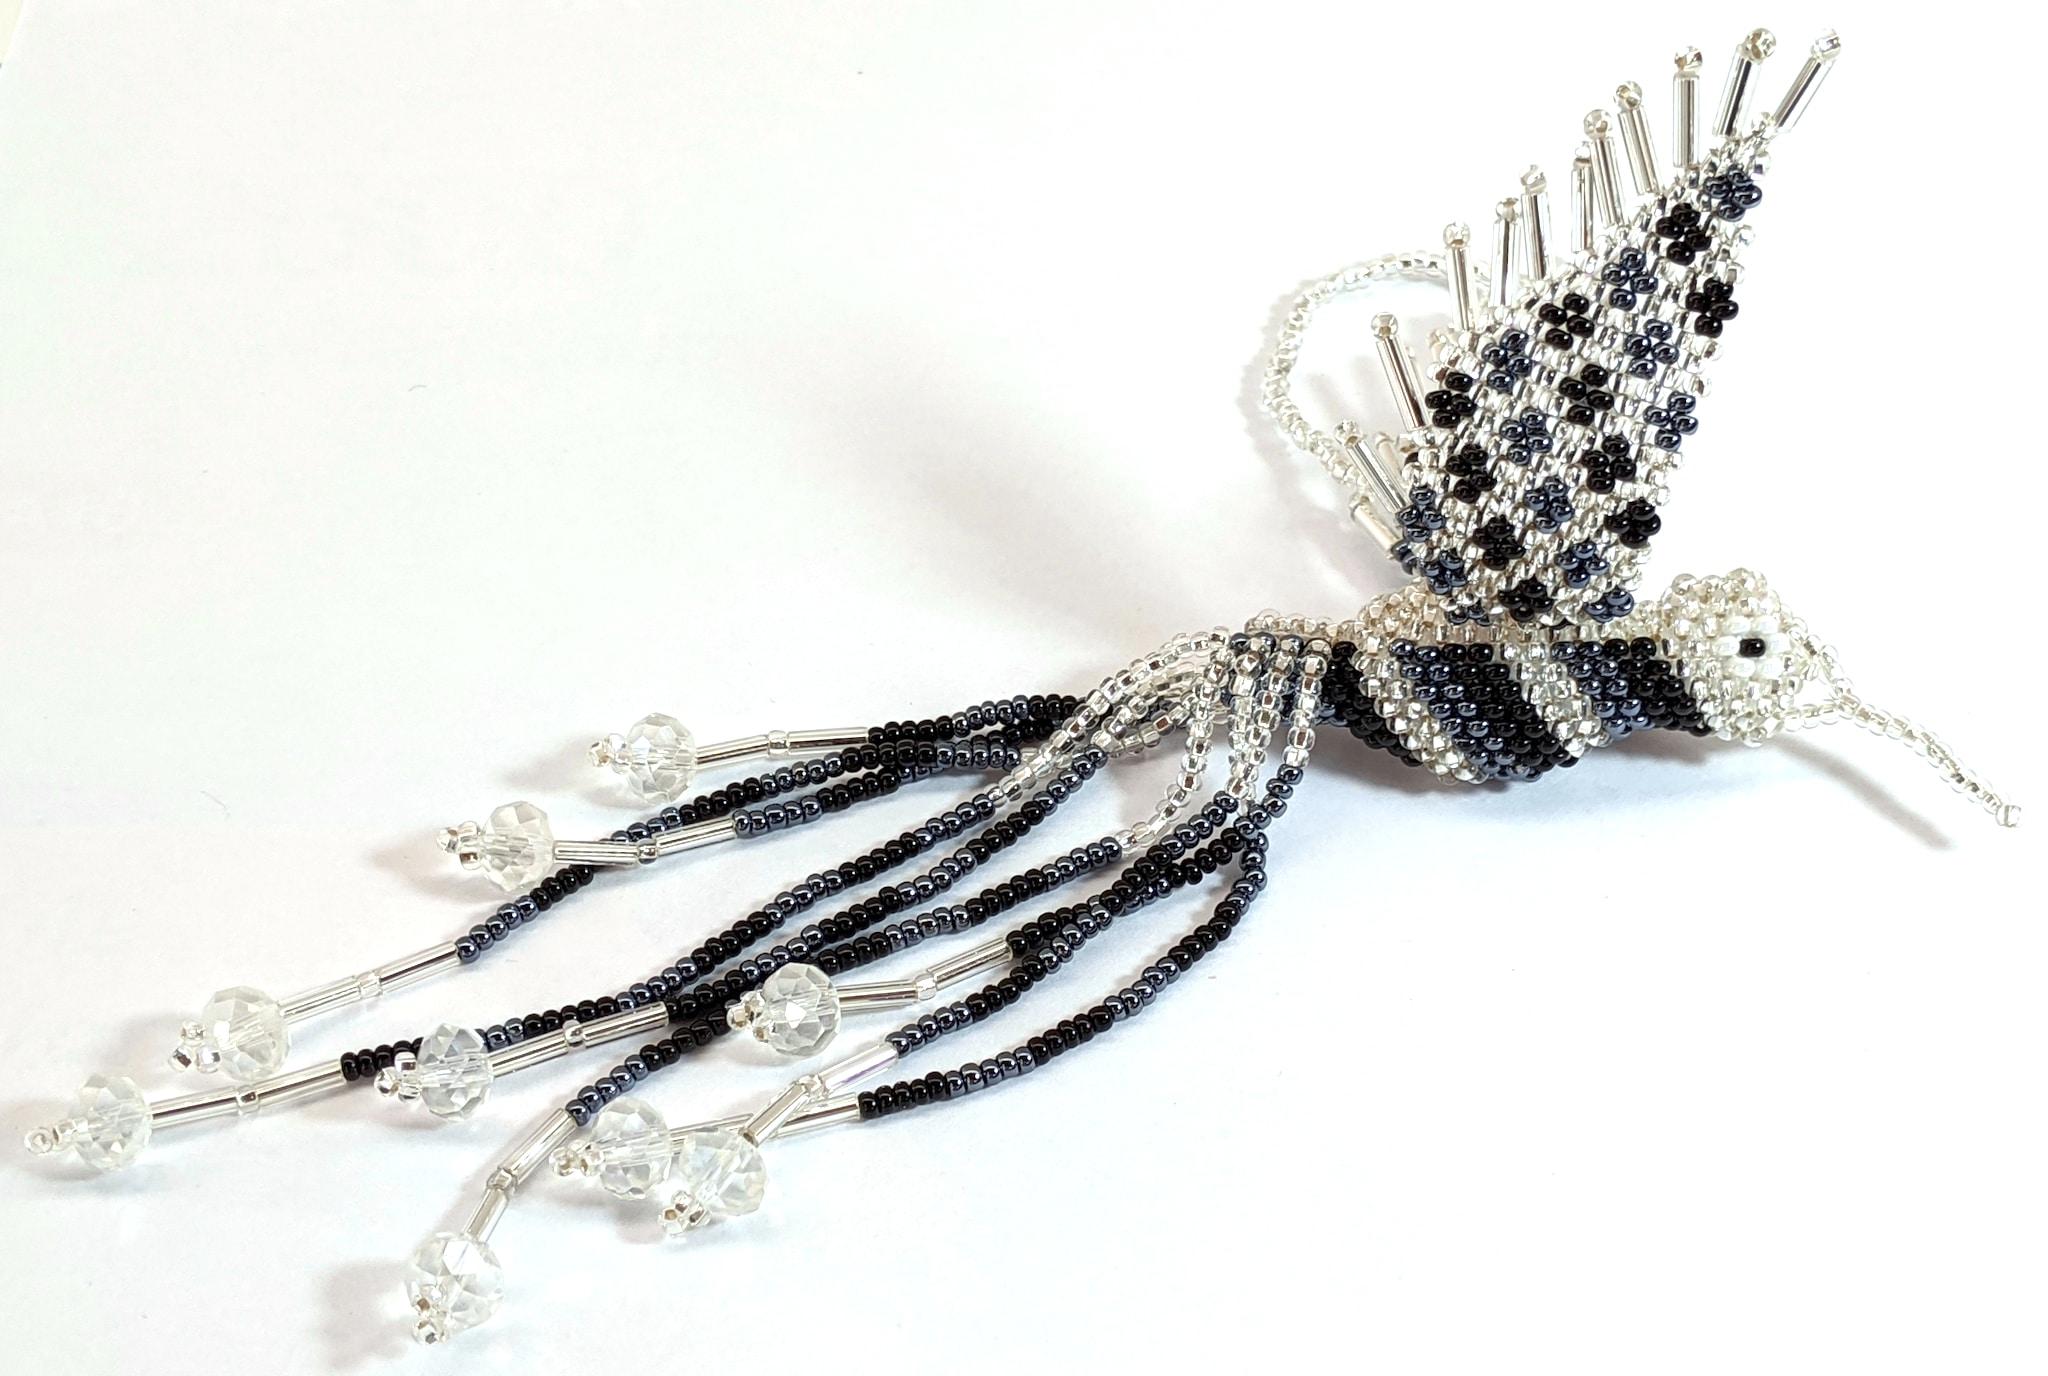 Hummingbird Beaded Ornament - Black, Hematite Gray, and Silver White